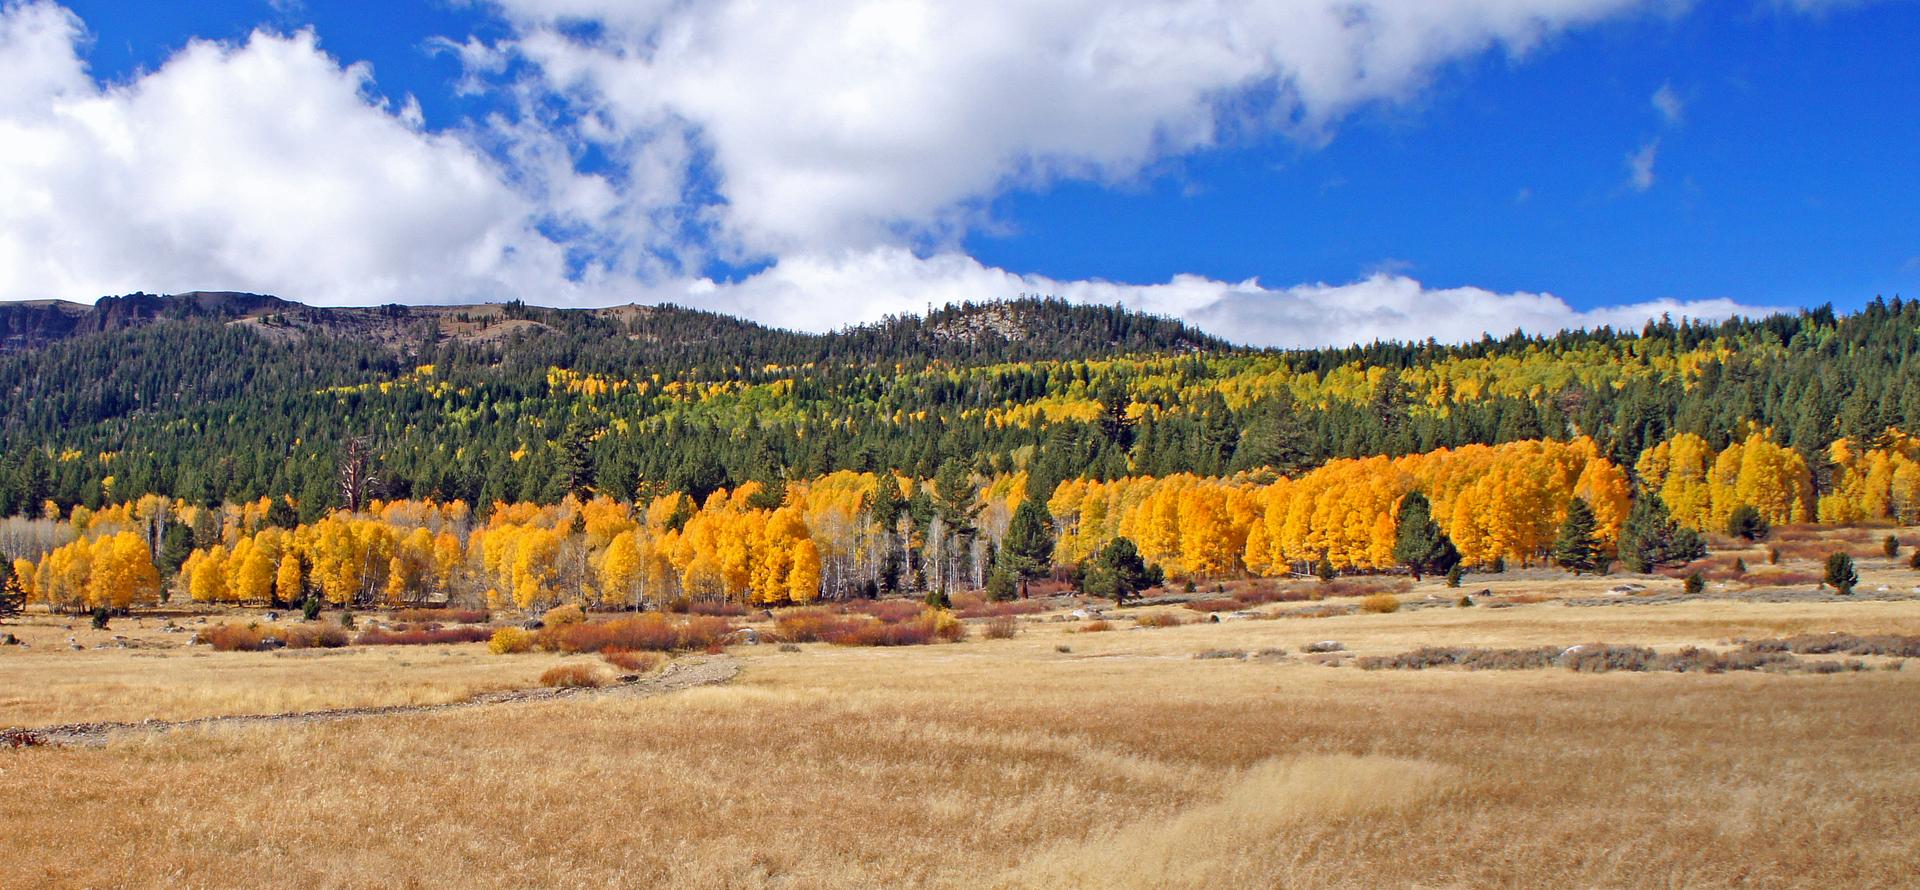 near Carson Pass, south of Lake Tahoe, California